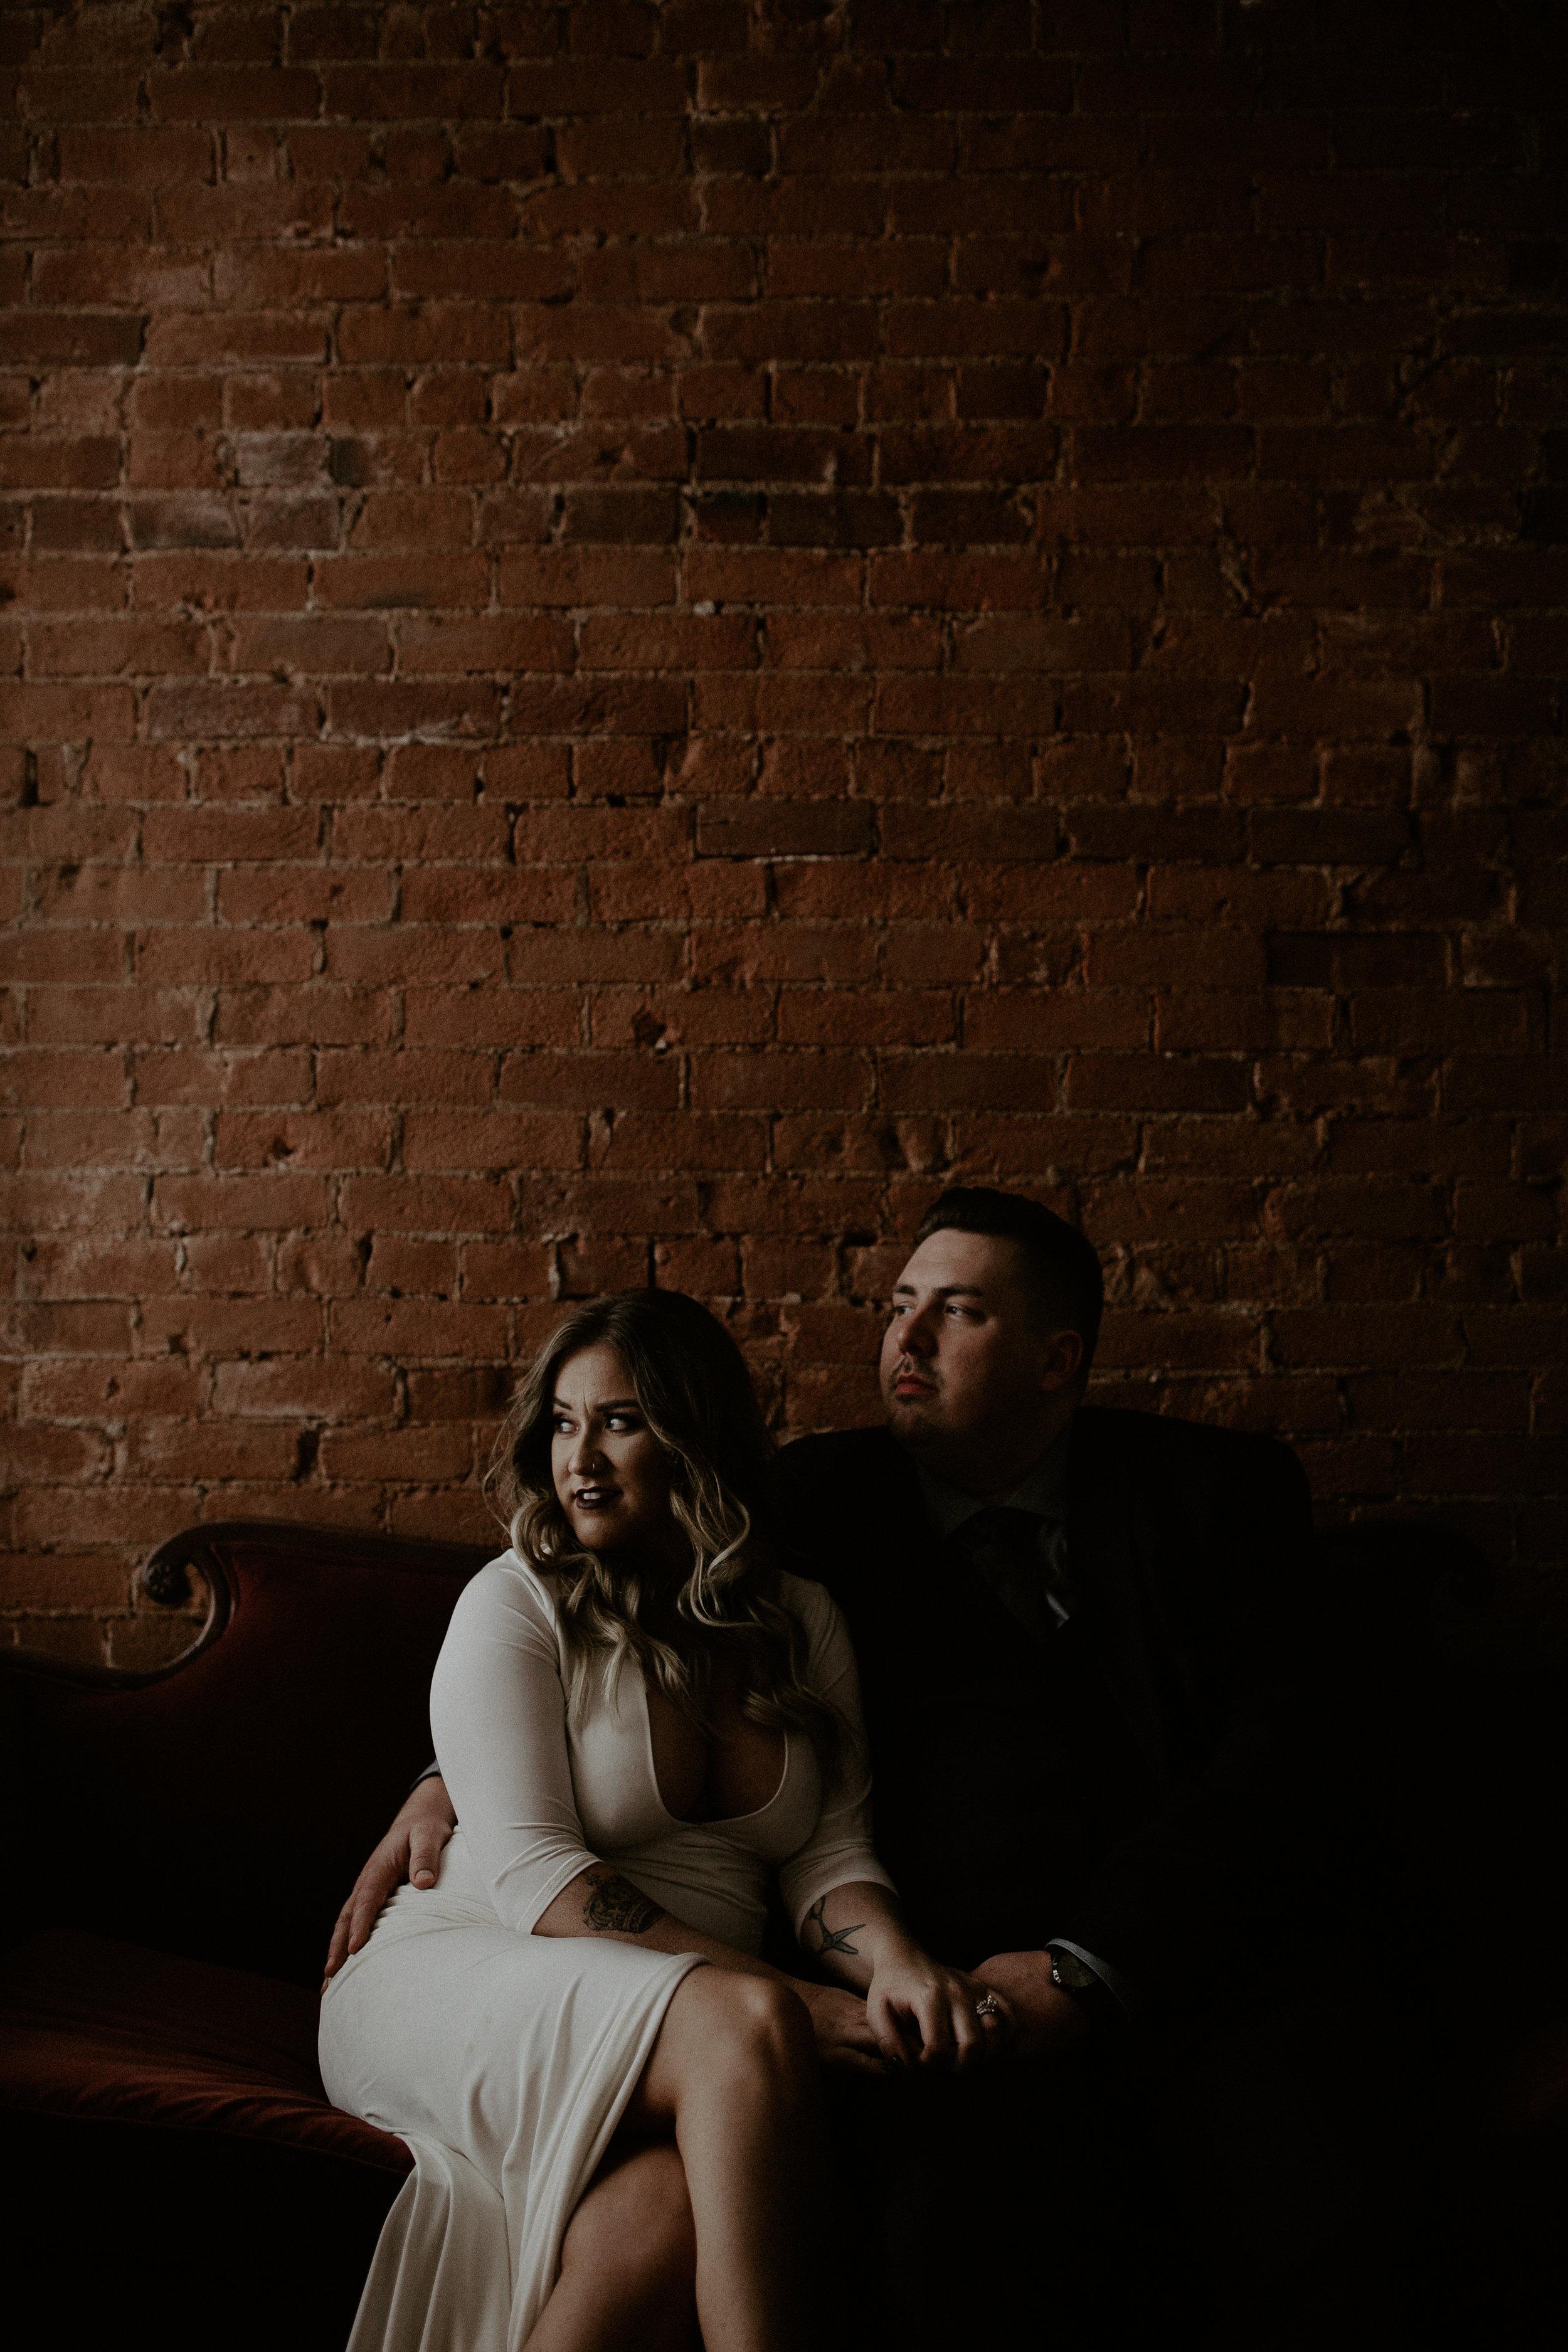 Jamie_Andrew-Urban_Artifact_Wedding-EDIT-157.JPG